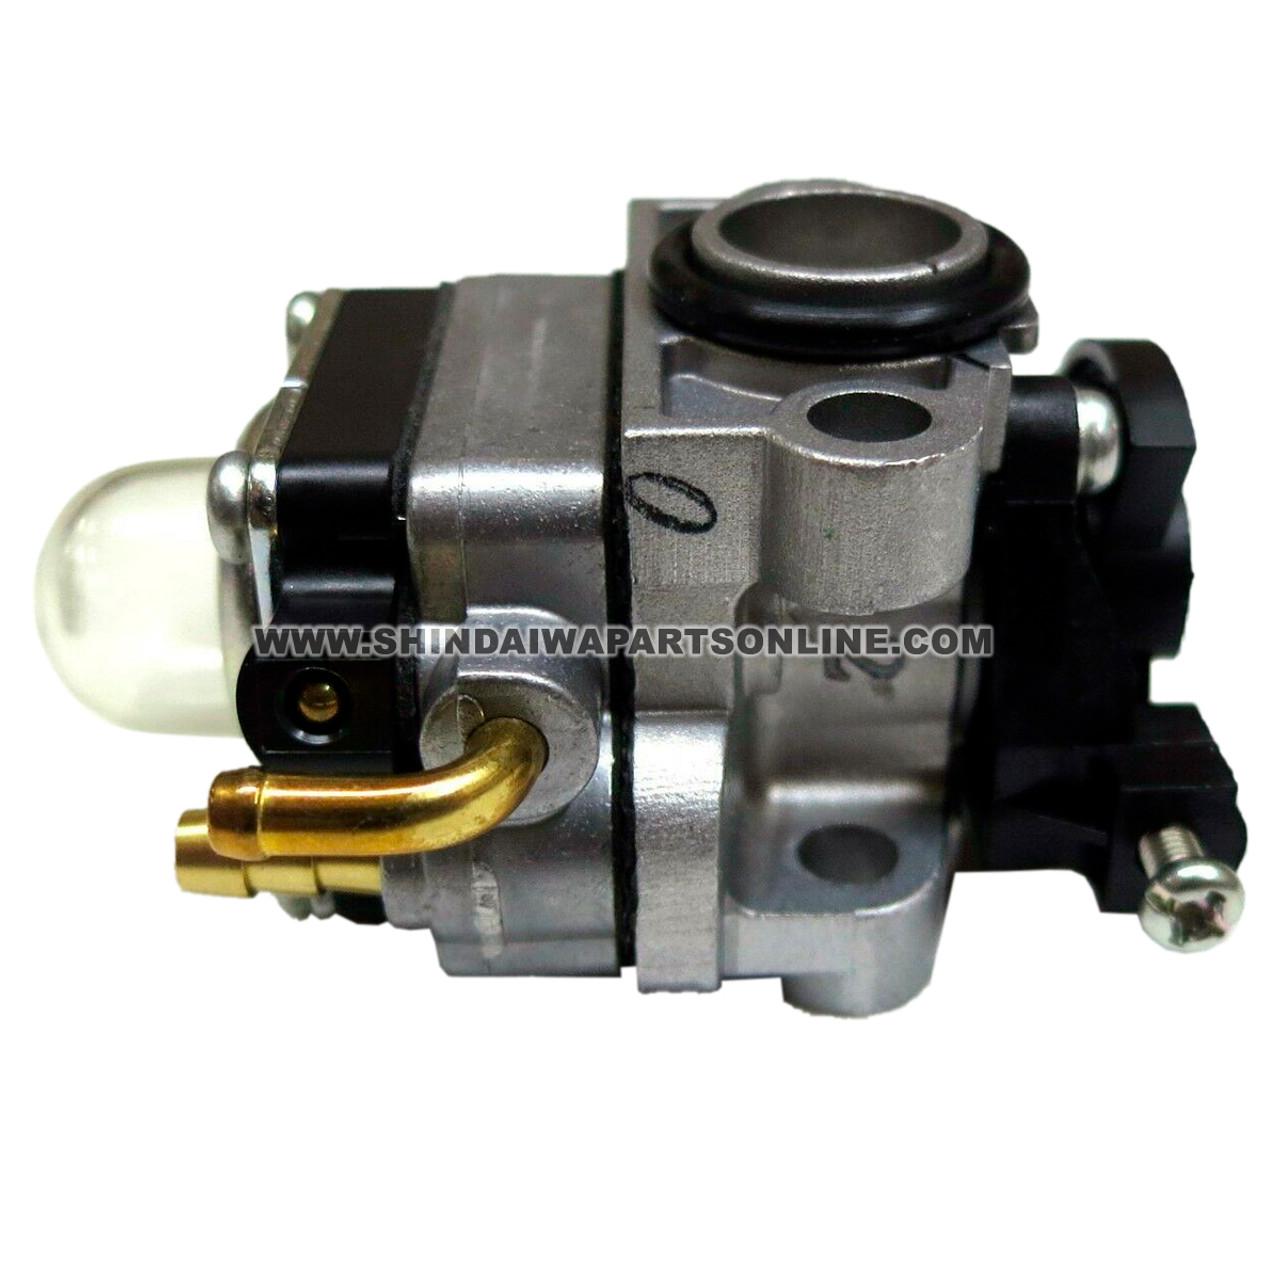 Shindaiwa S230//EPA Trimmer Weed Eater Carburetor Carb